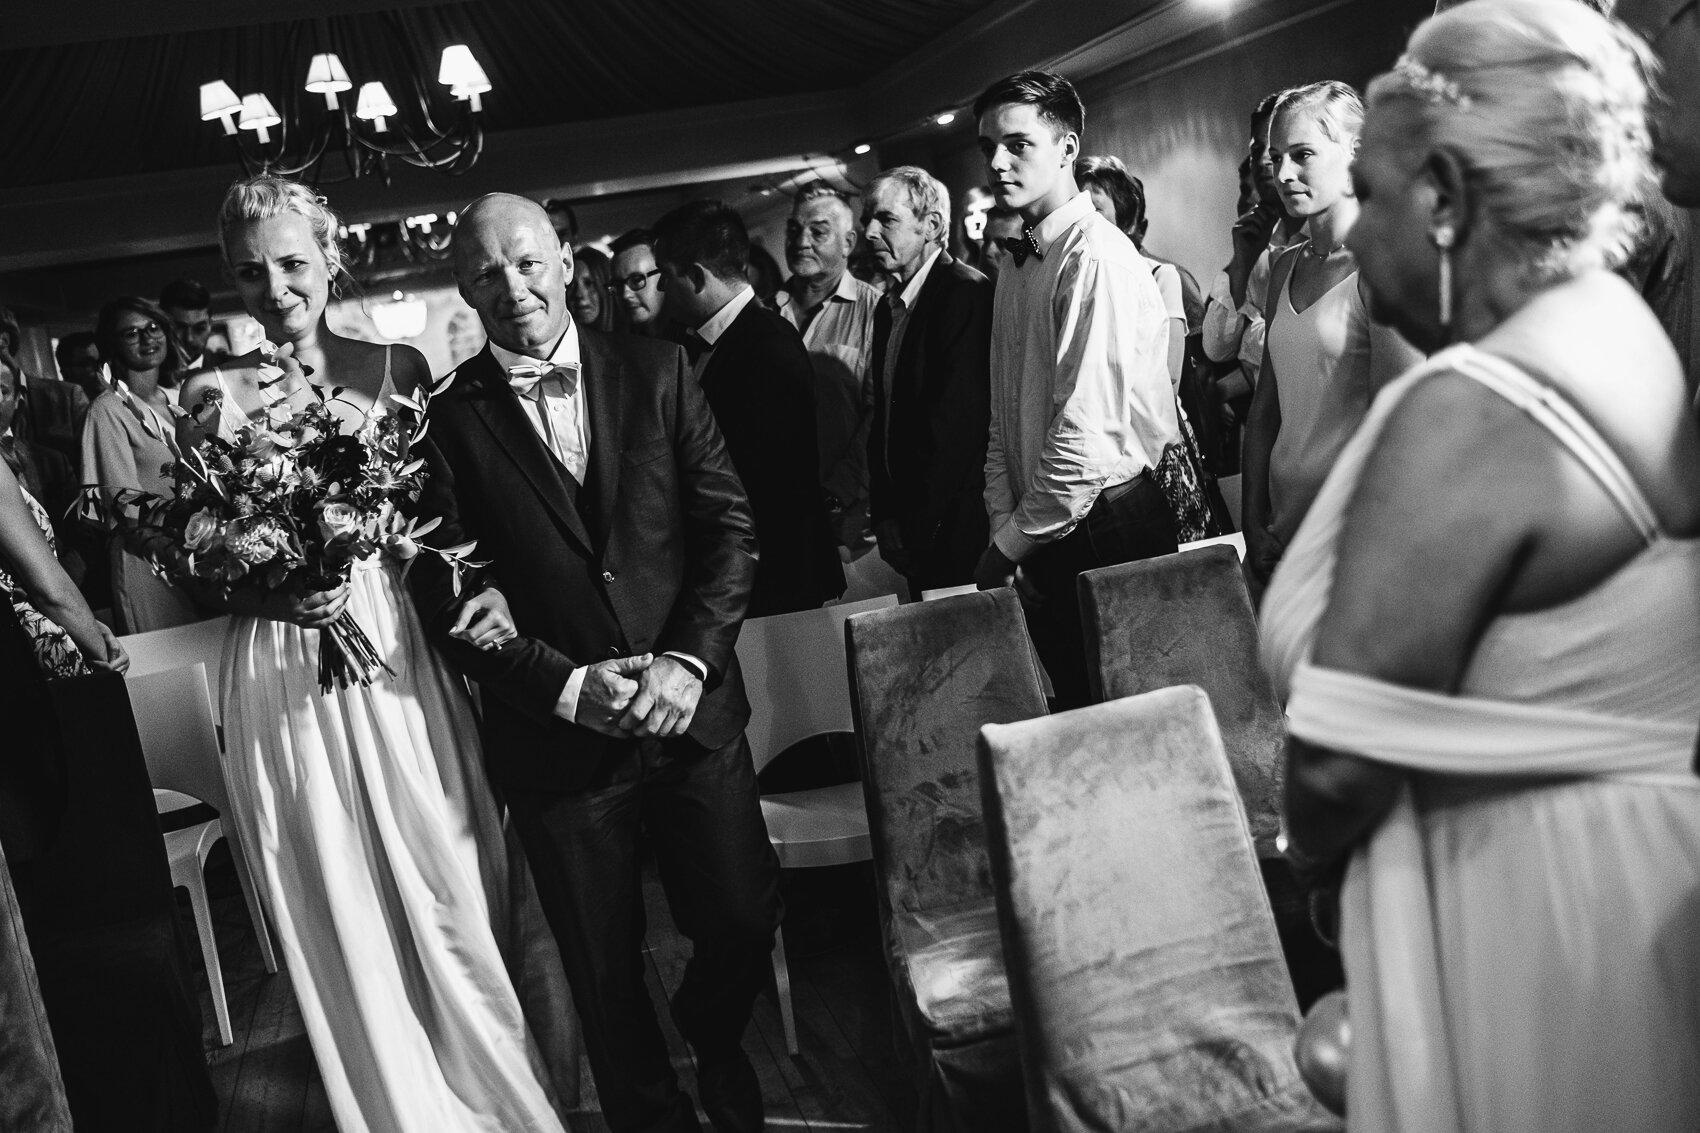 iso800 - huwelijksfotograaf isabo matthias verbeke foundation-22.jpg